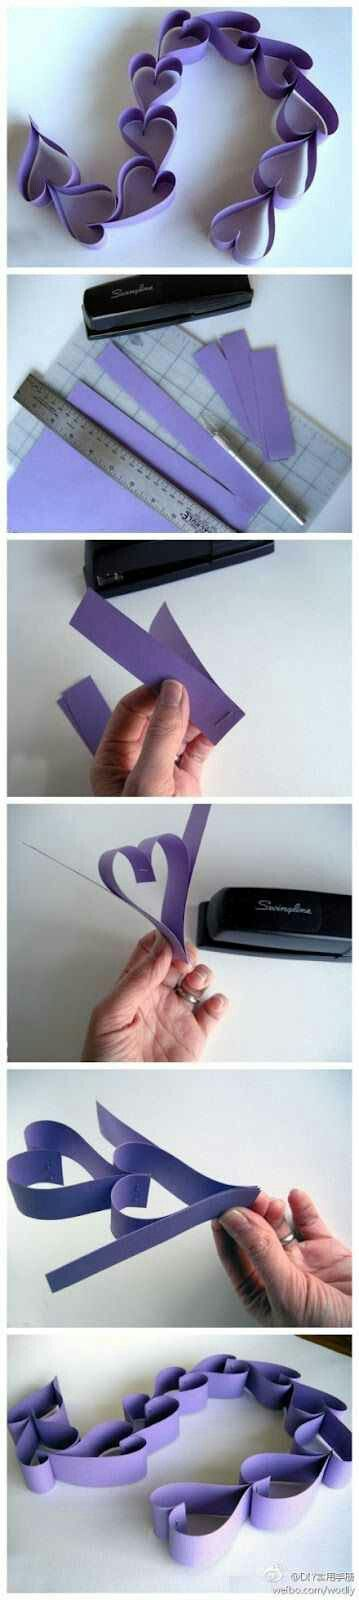 simple-diy-paper-craft-ideas-11